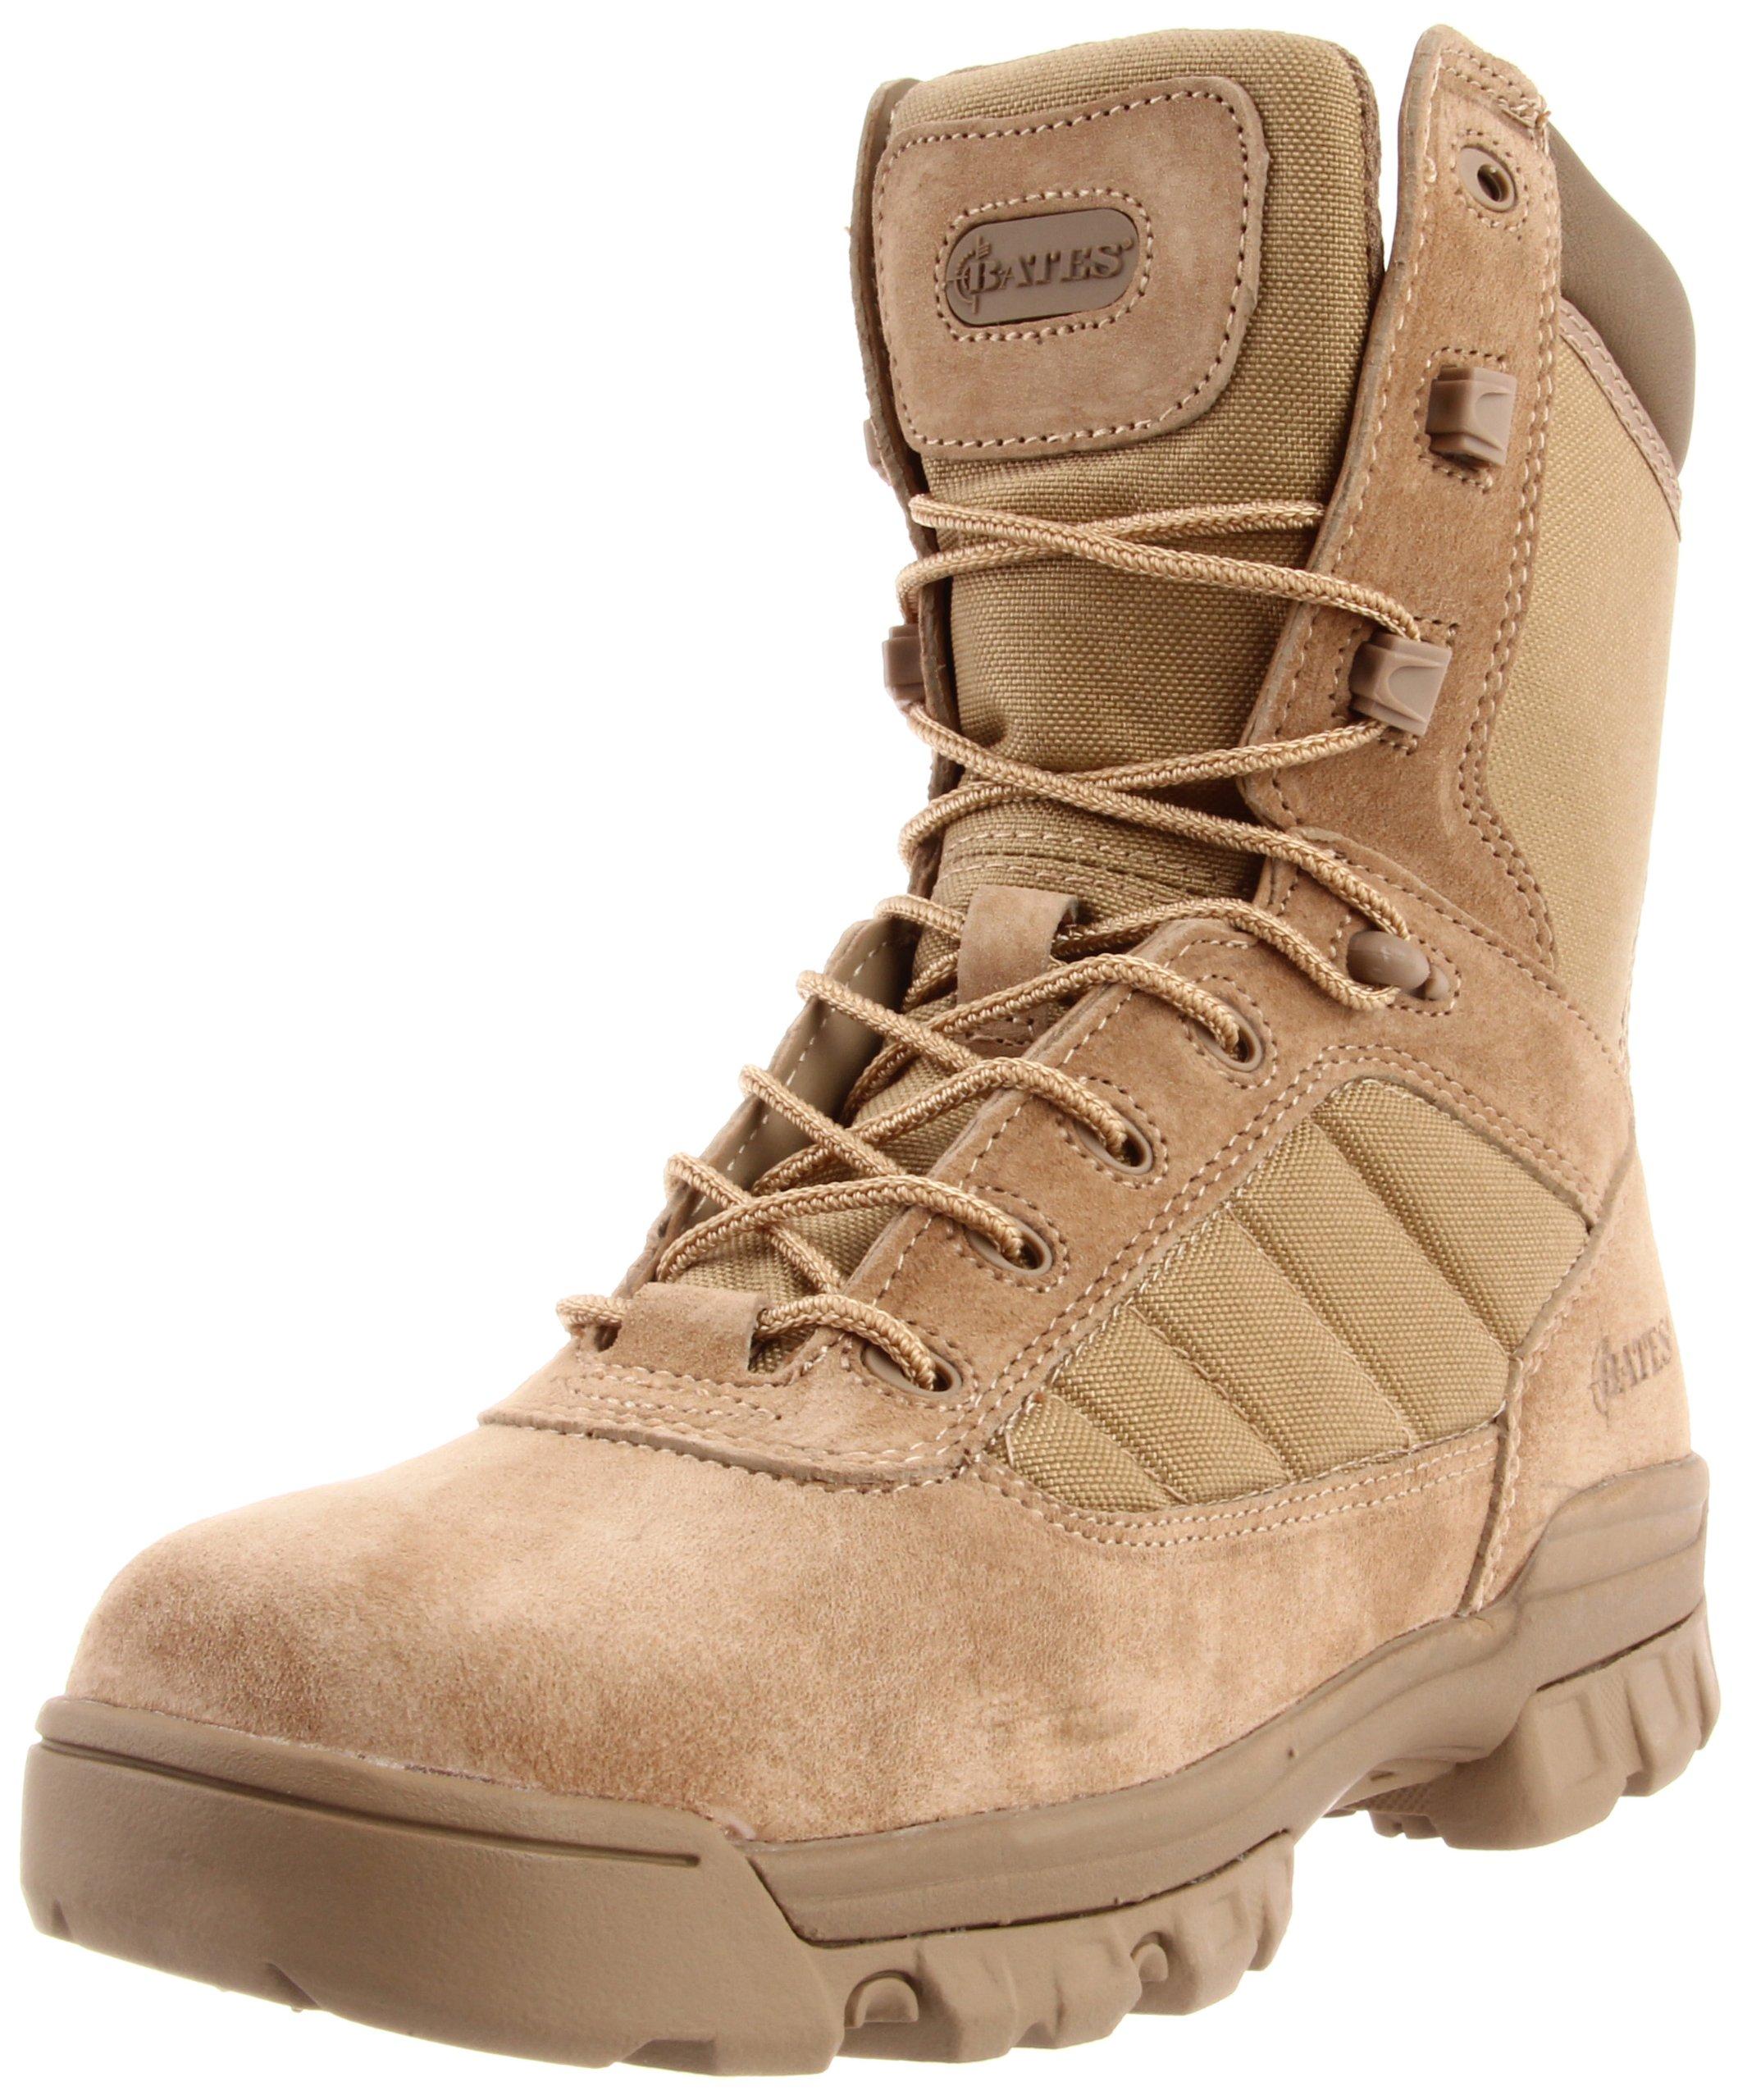 Bates Men's 8 Inch Uniform Boot, Desert, 15 M US